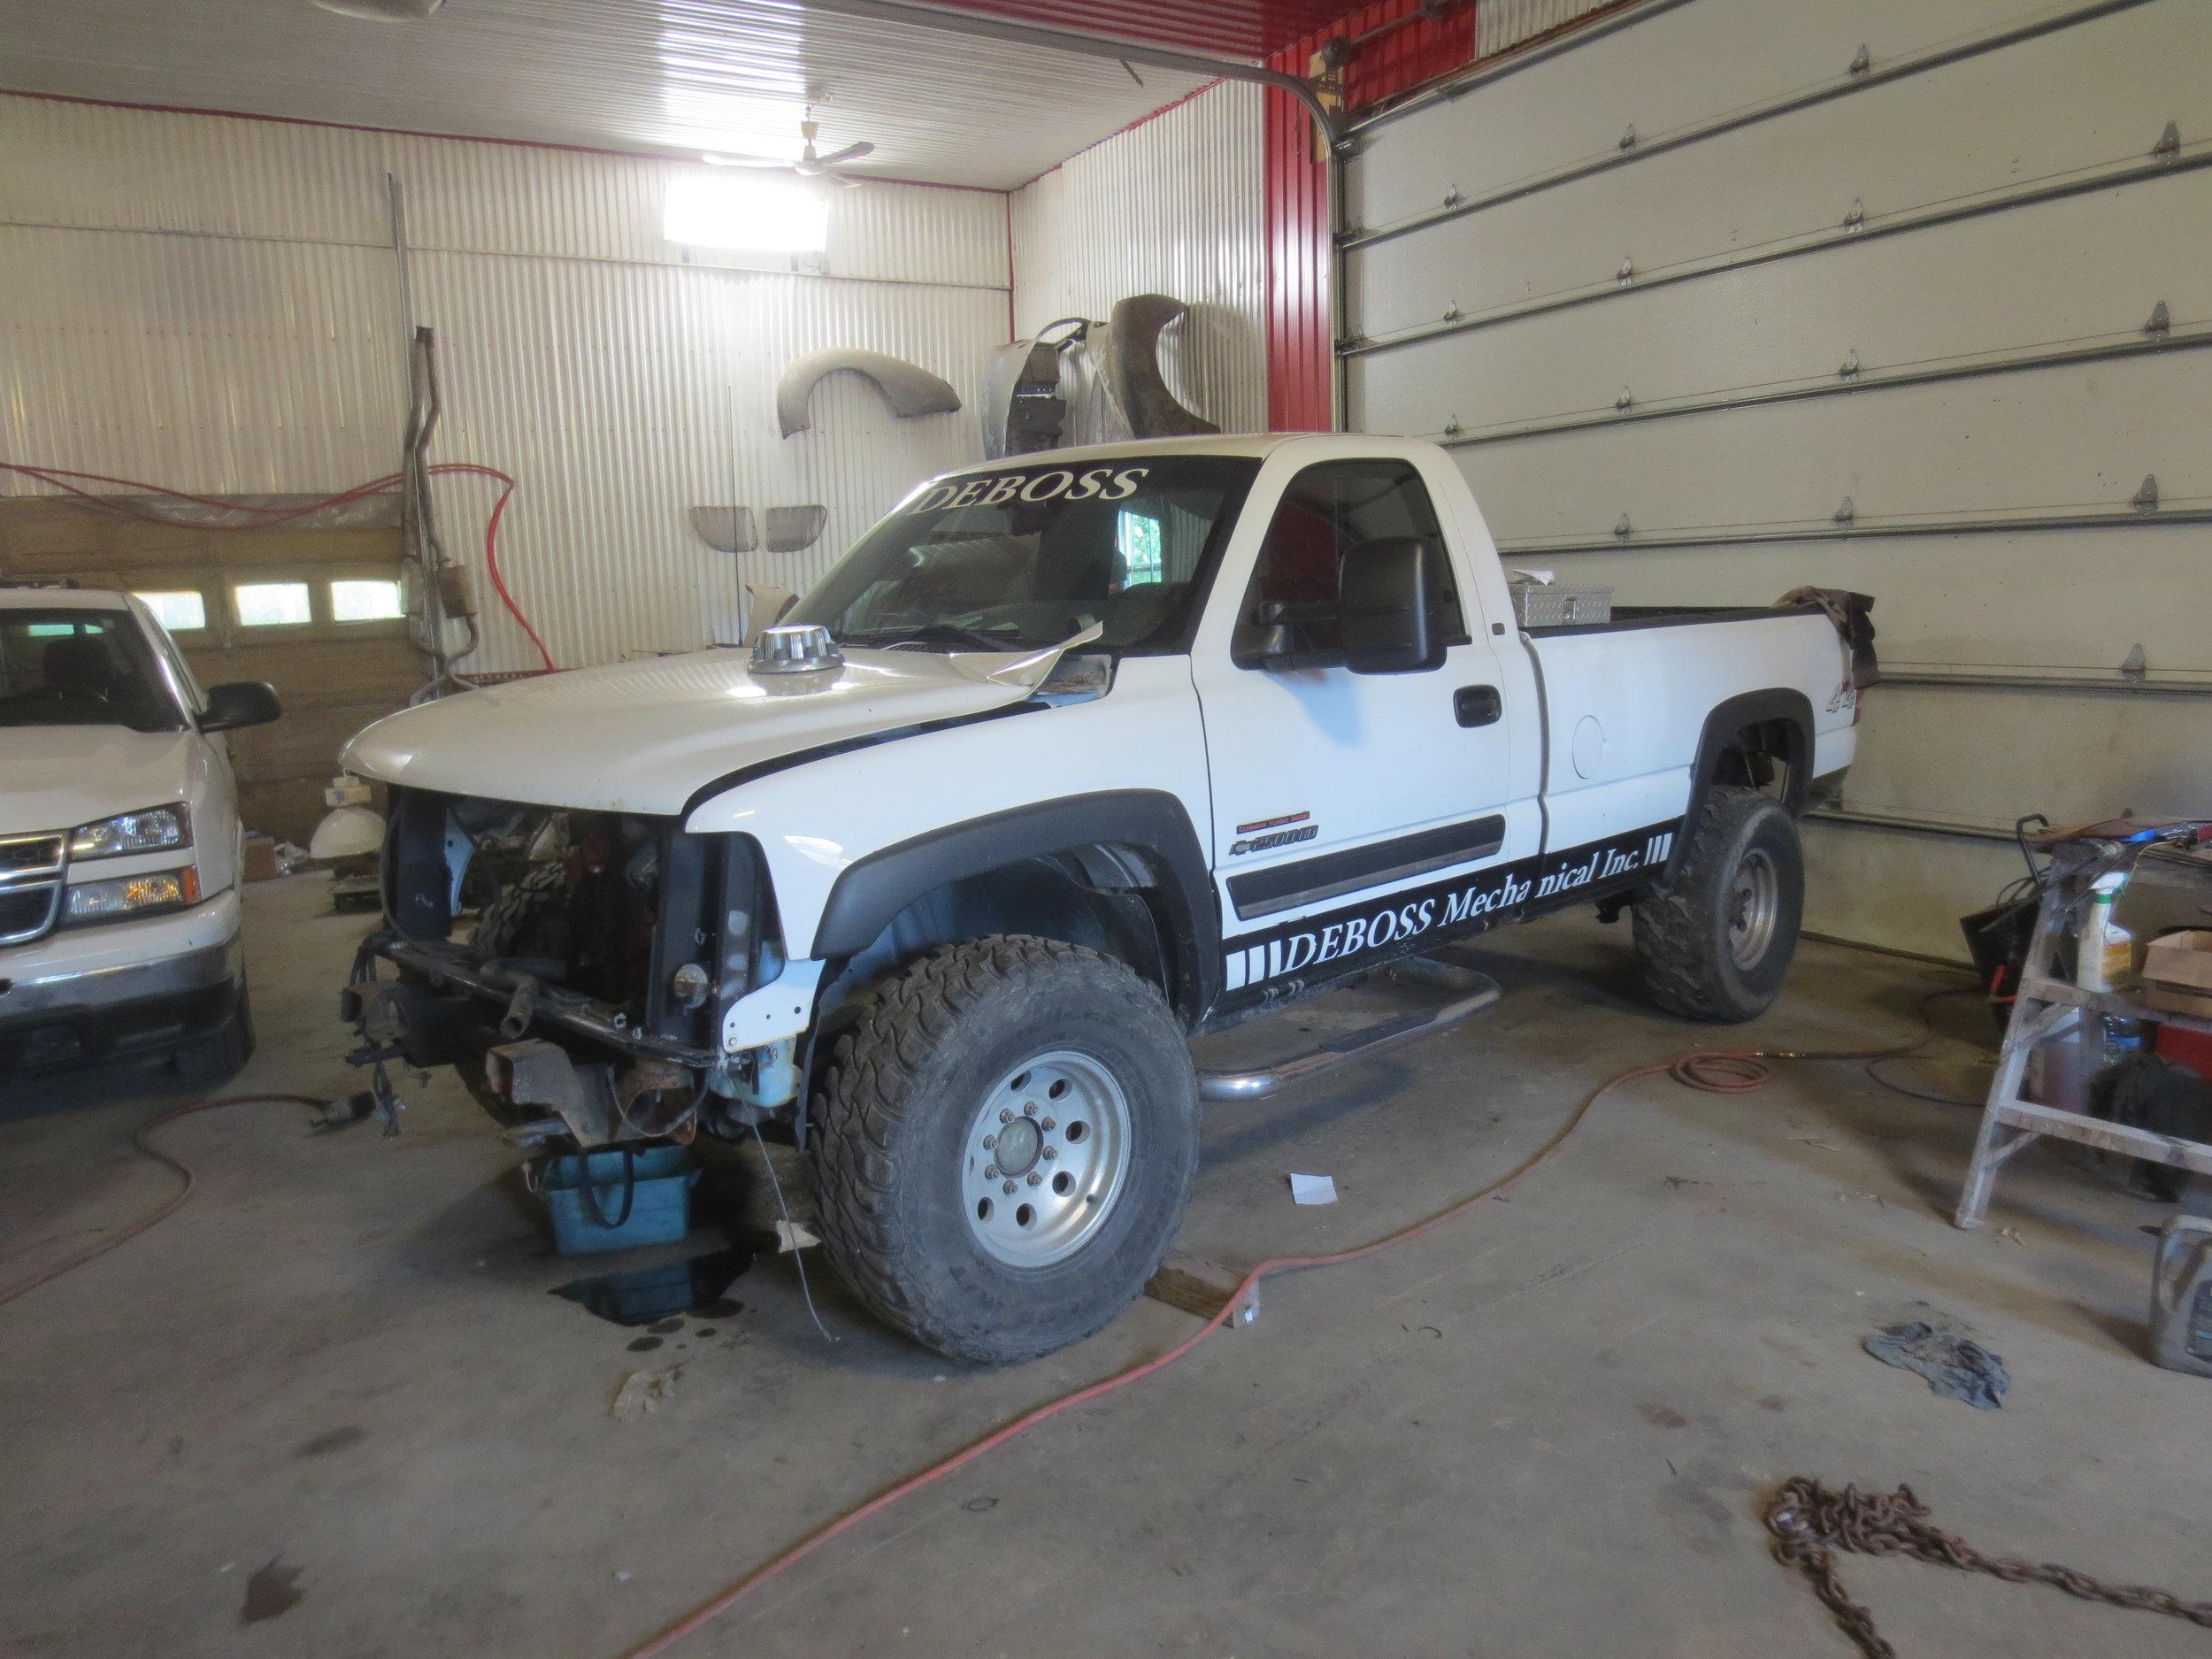 6bt Silverado Deboss Garage 1976 Chevy Truck 4x4 For Sale Well Its Time A Rebuild